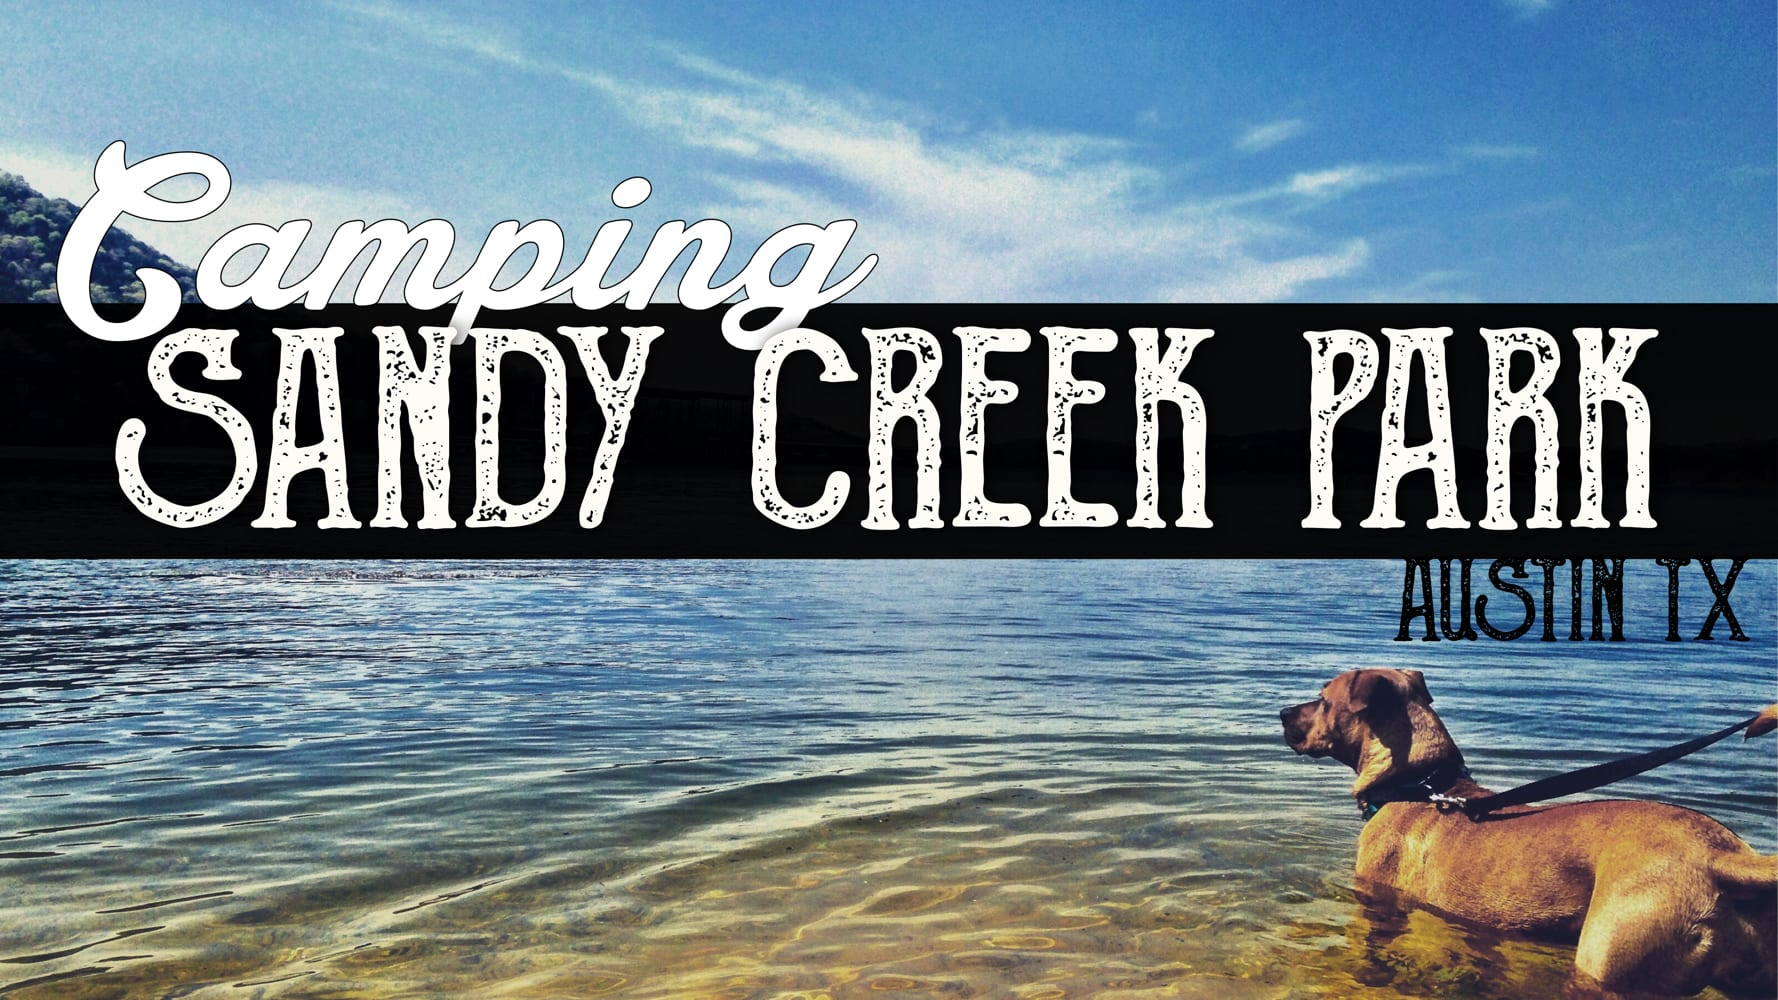 Boondocking at Sandy Creek Park – Greater Austin, Texas